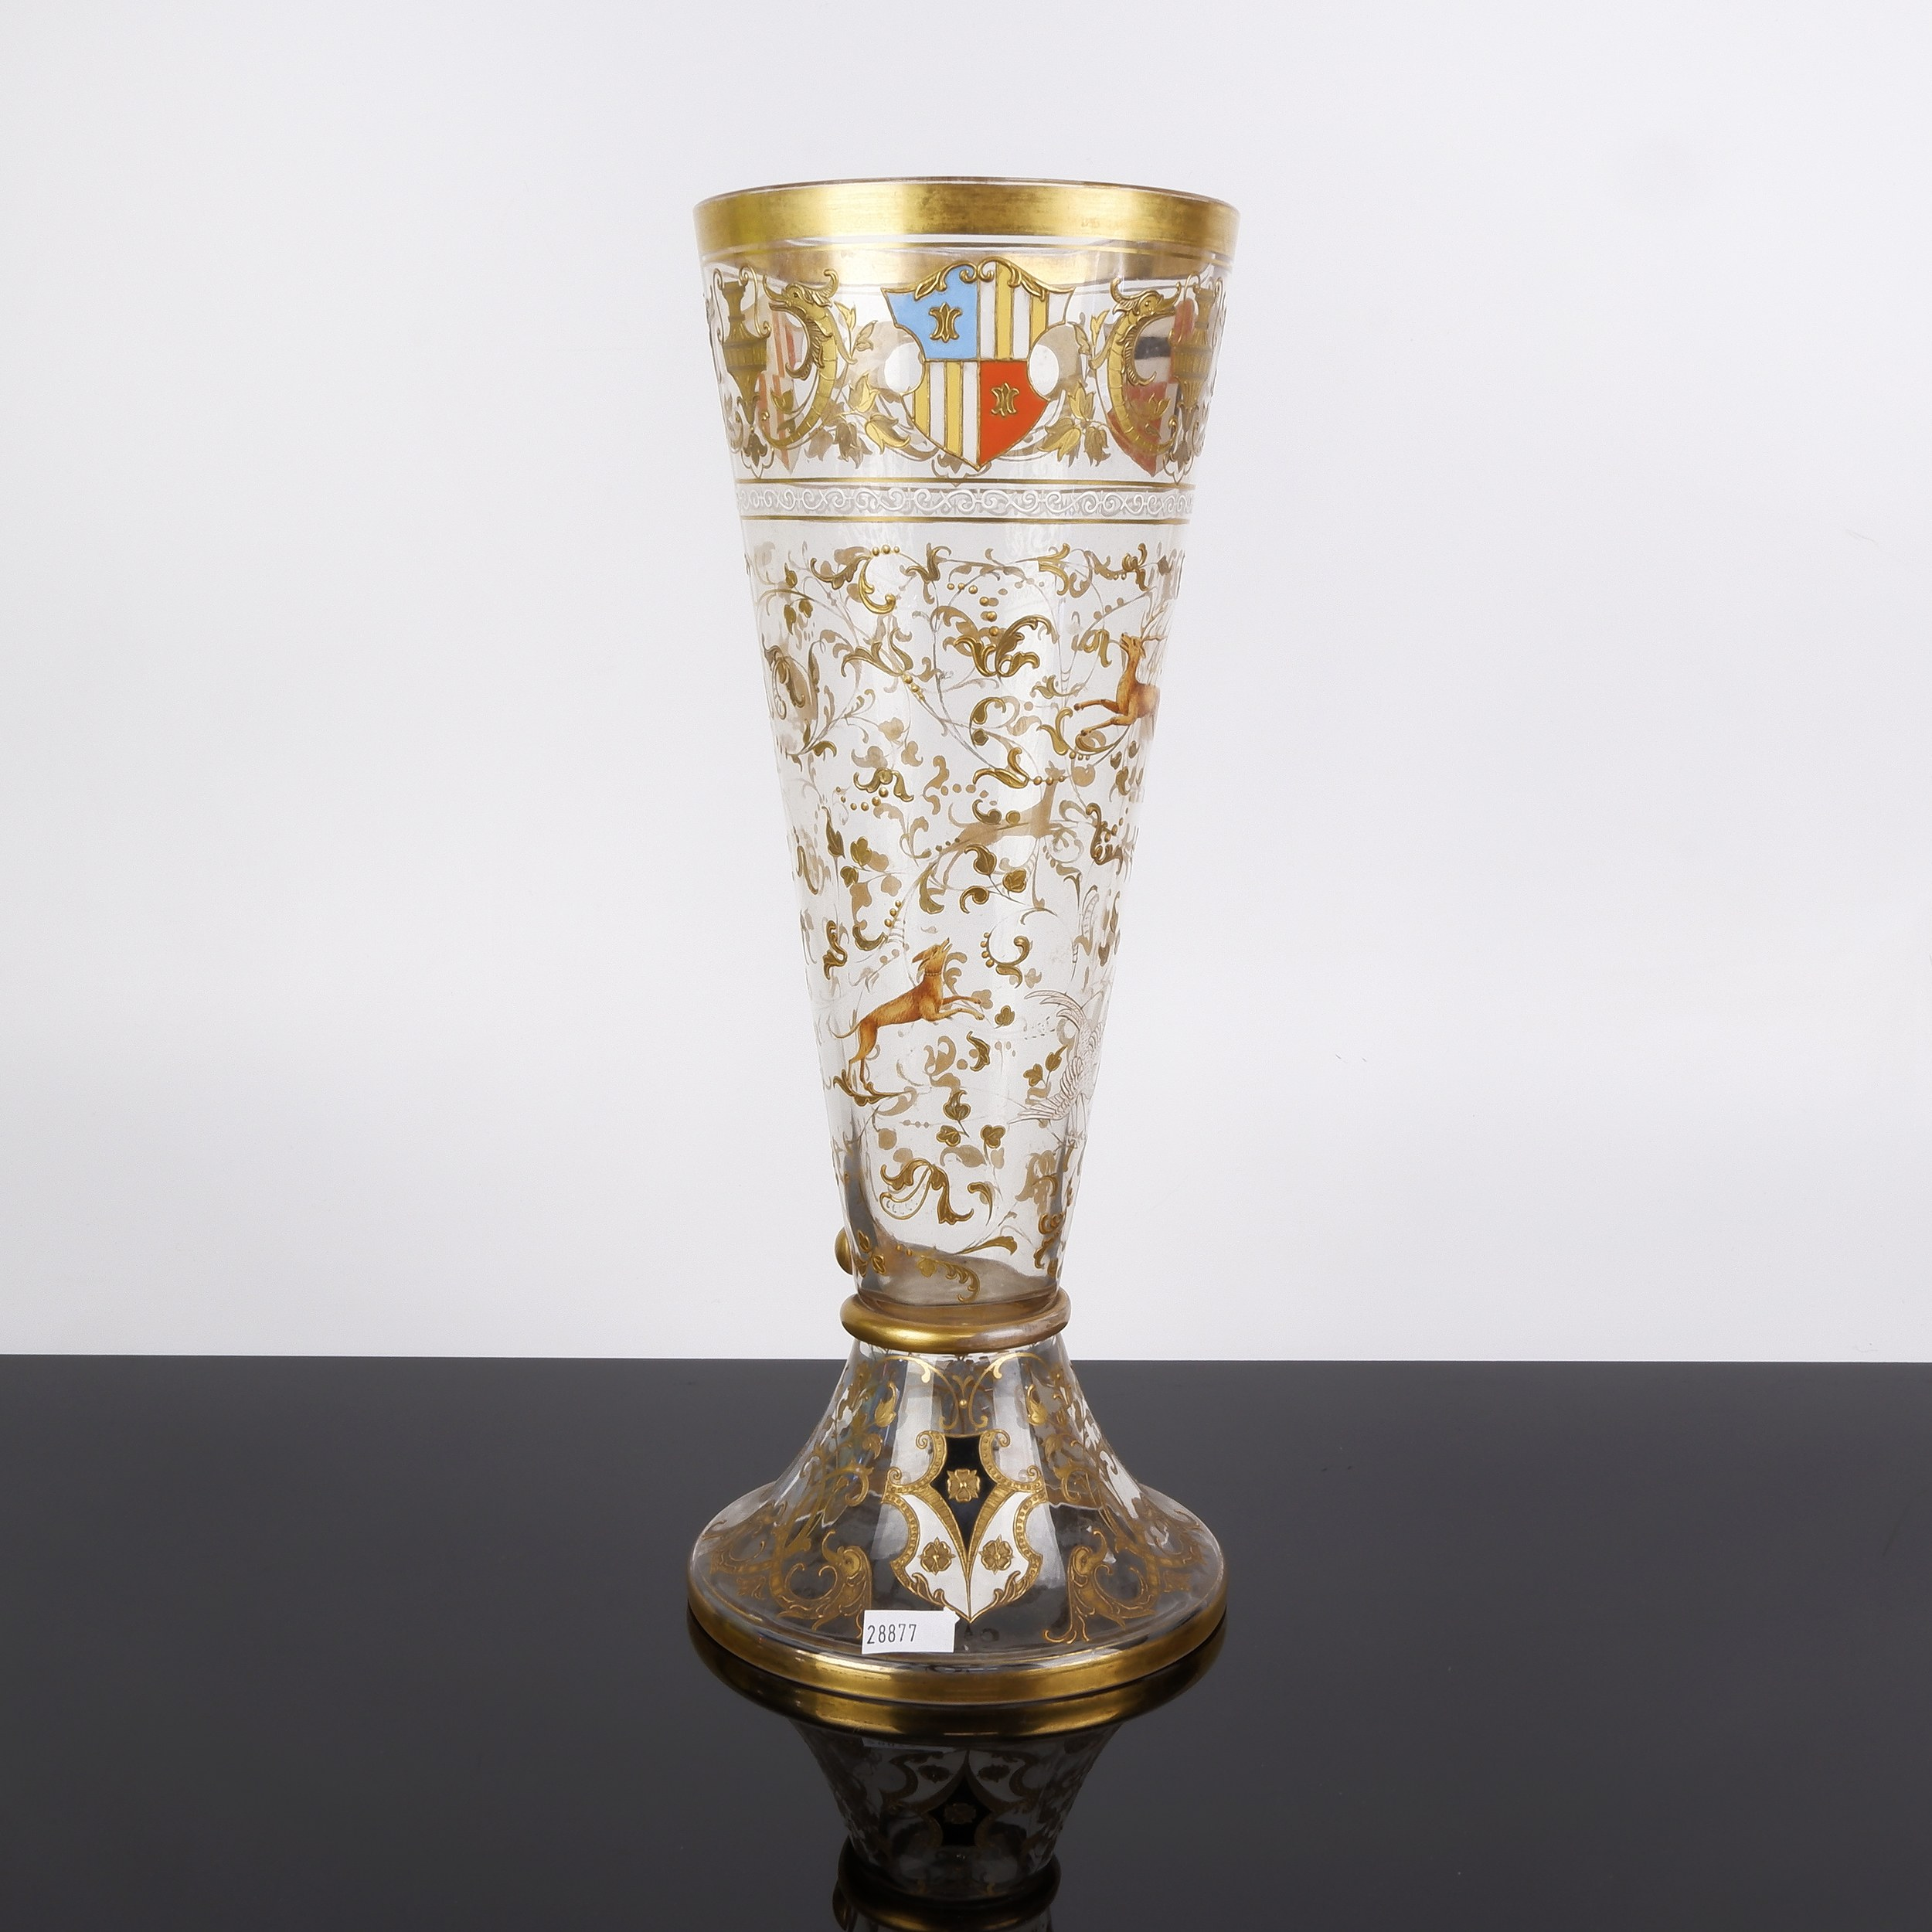 'Impressive 19th Century Enamelled and Gilded Glass Armorial Beaker or Celery Vase'